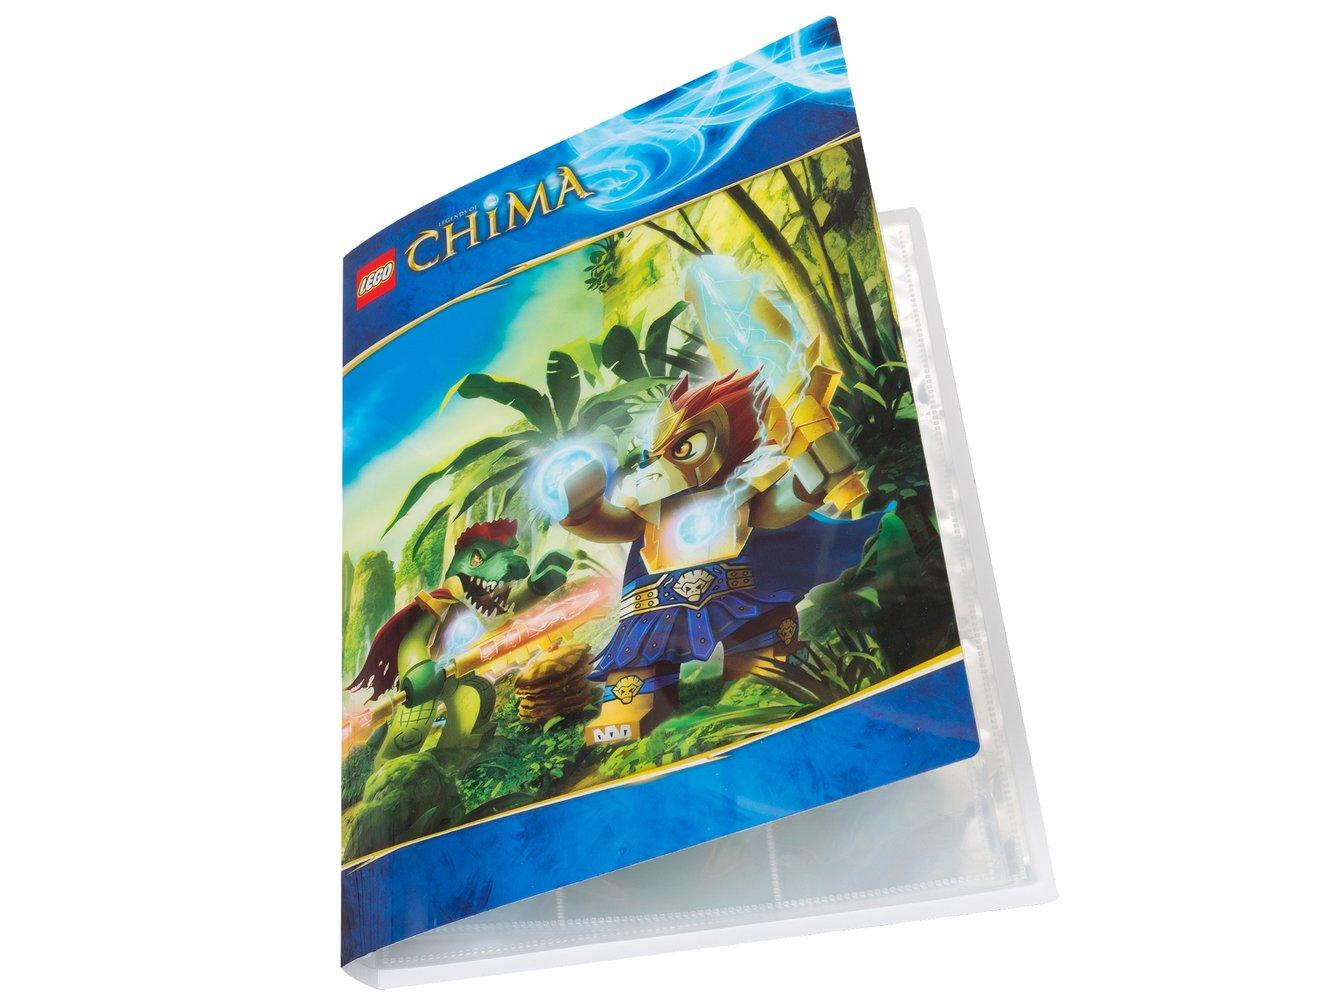 Legends of Chima Game Cards Binder